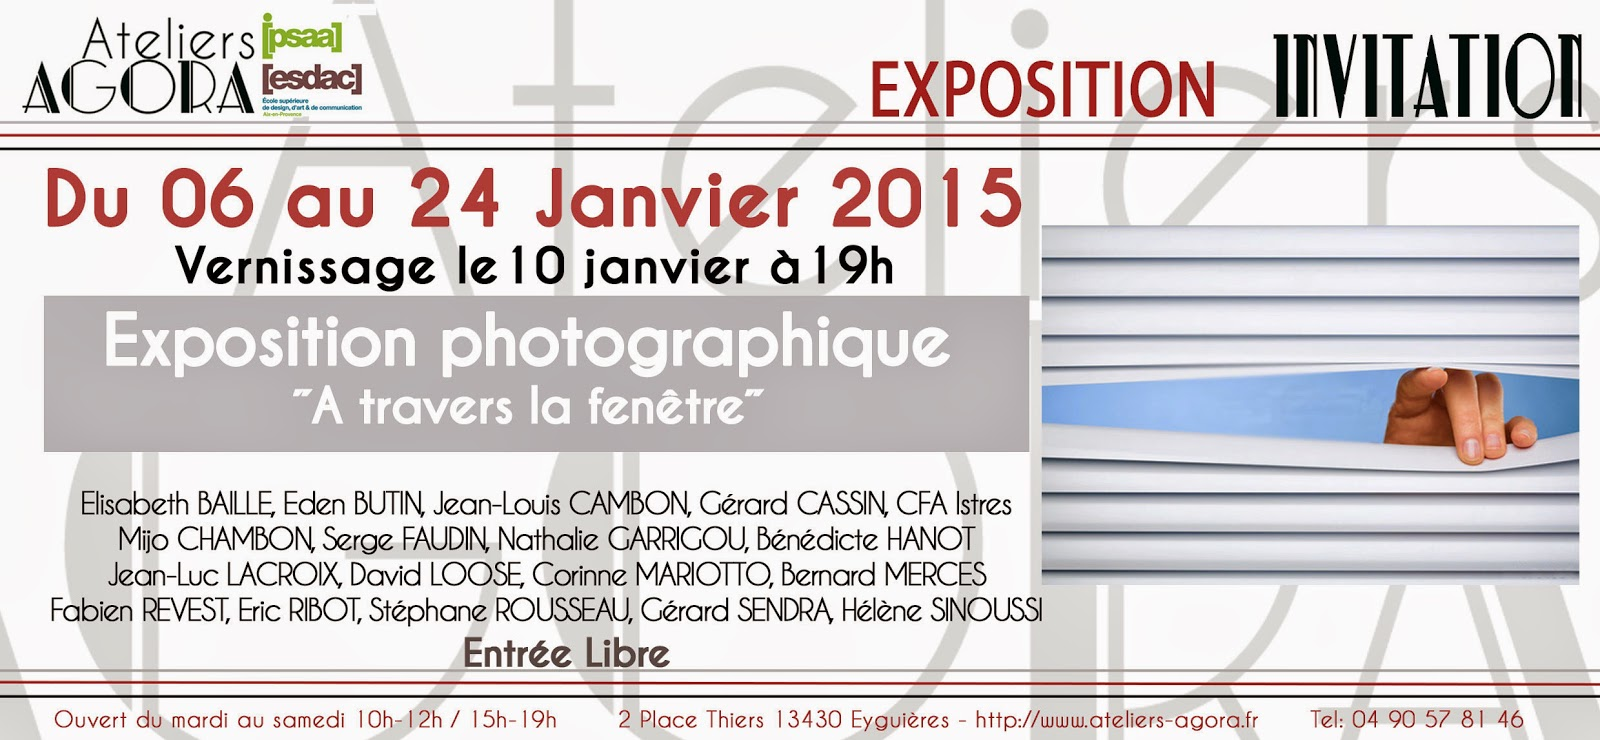 http://ateliersagora.blogspot.com/2014/12/expo-photos-collective-travers-la.html